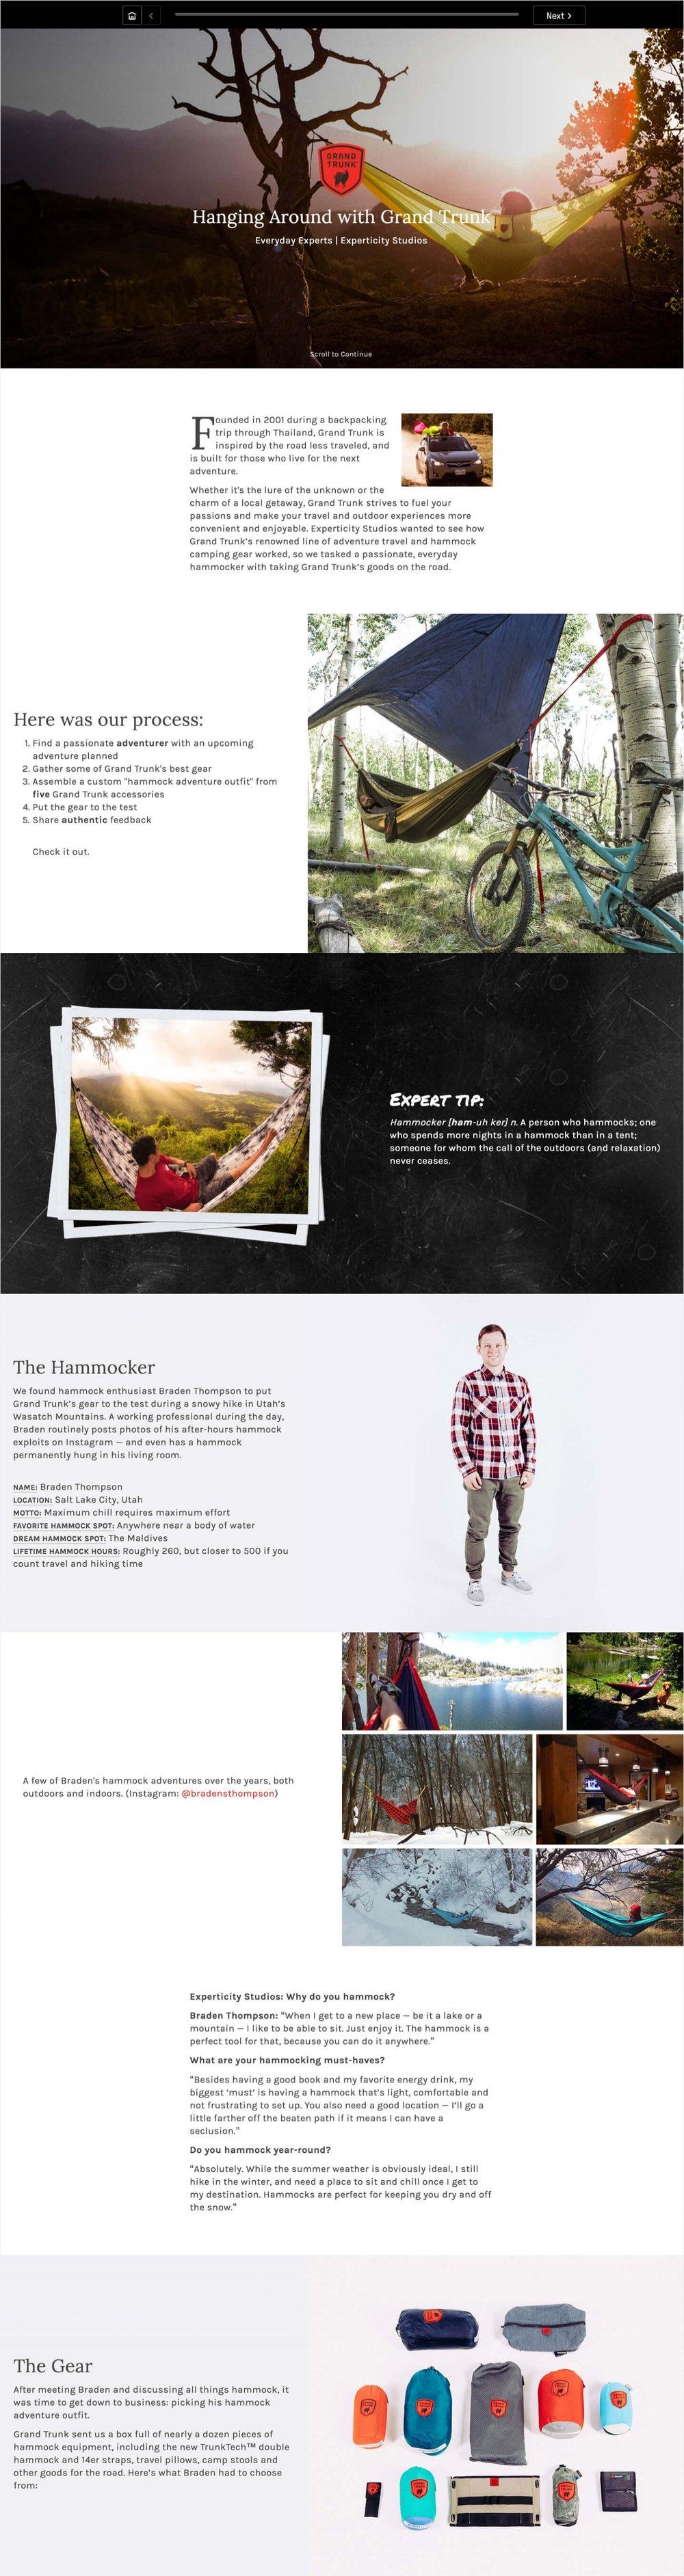 grandtrunk_desktop-1.jpg